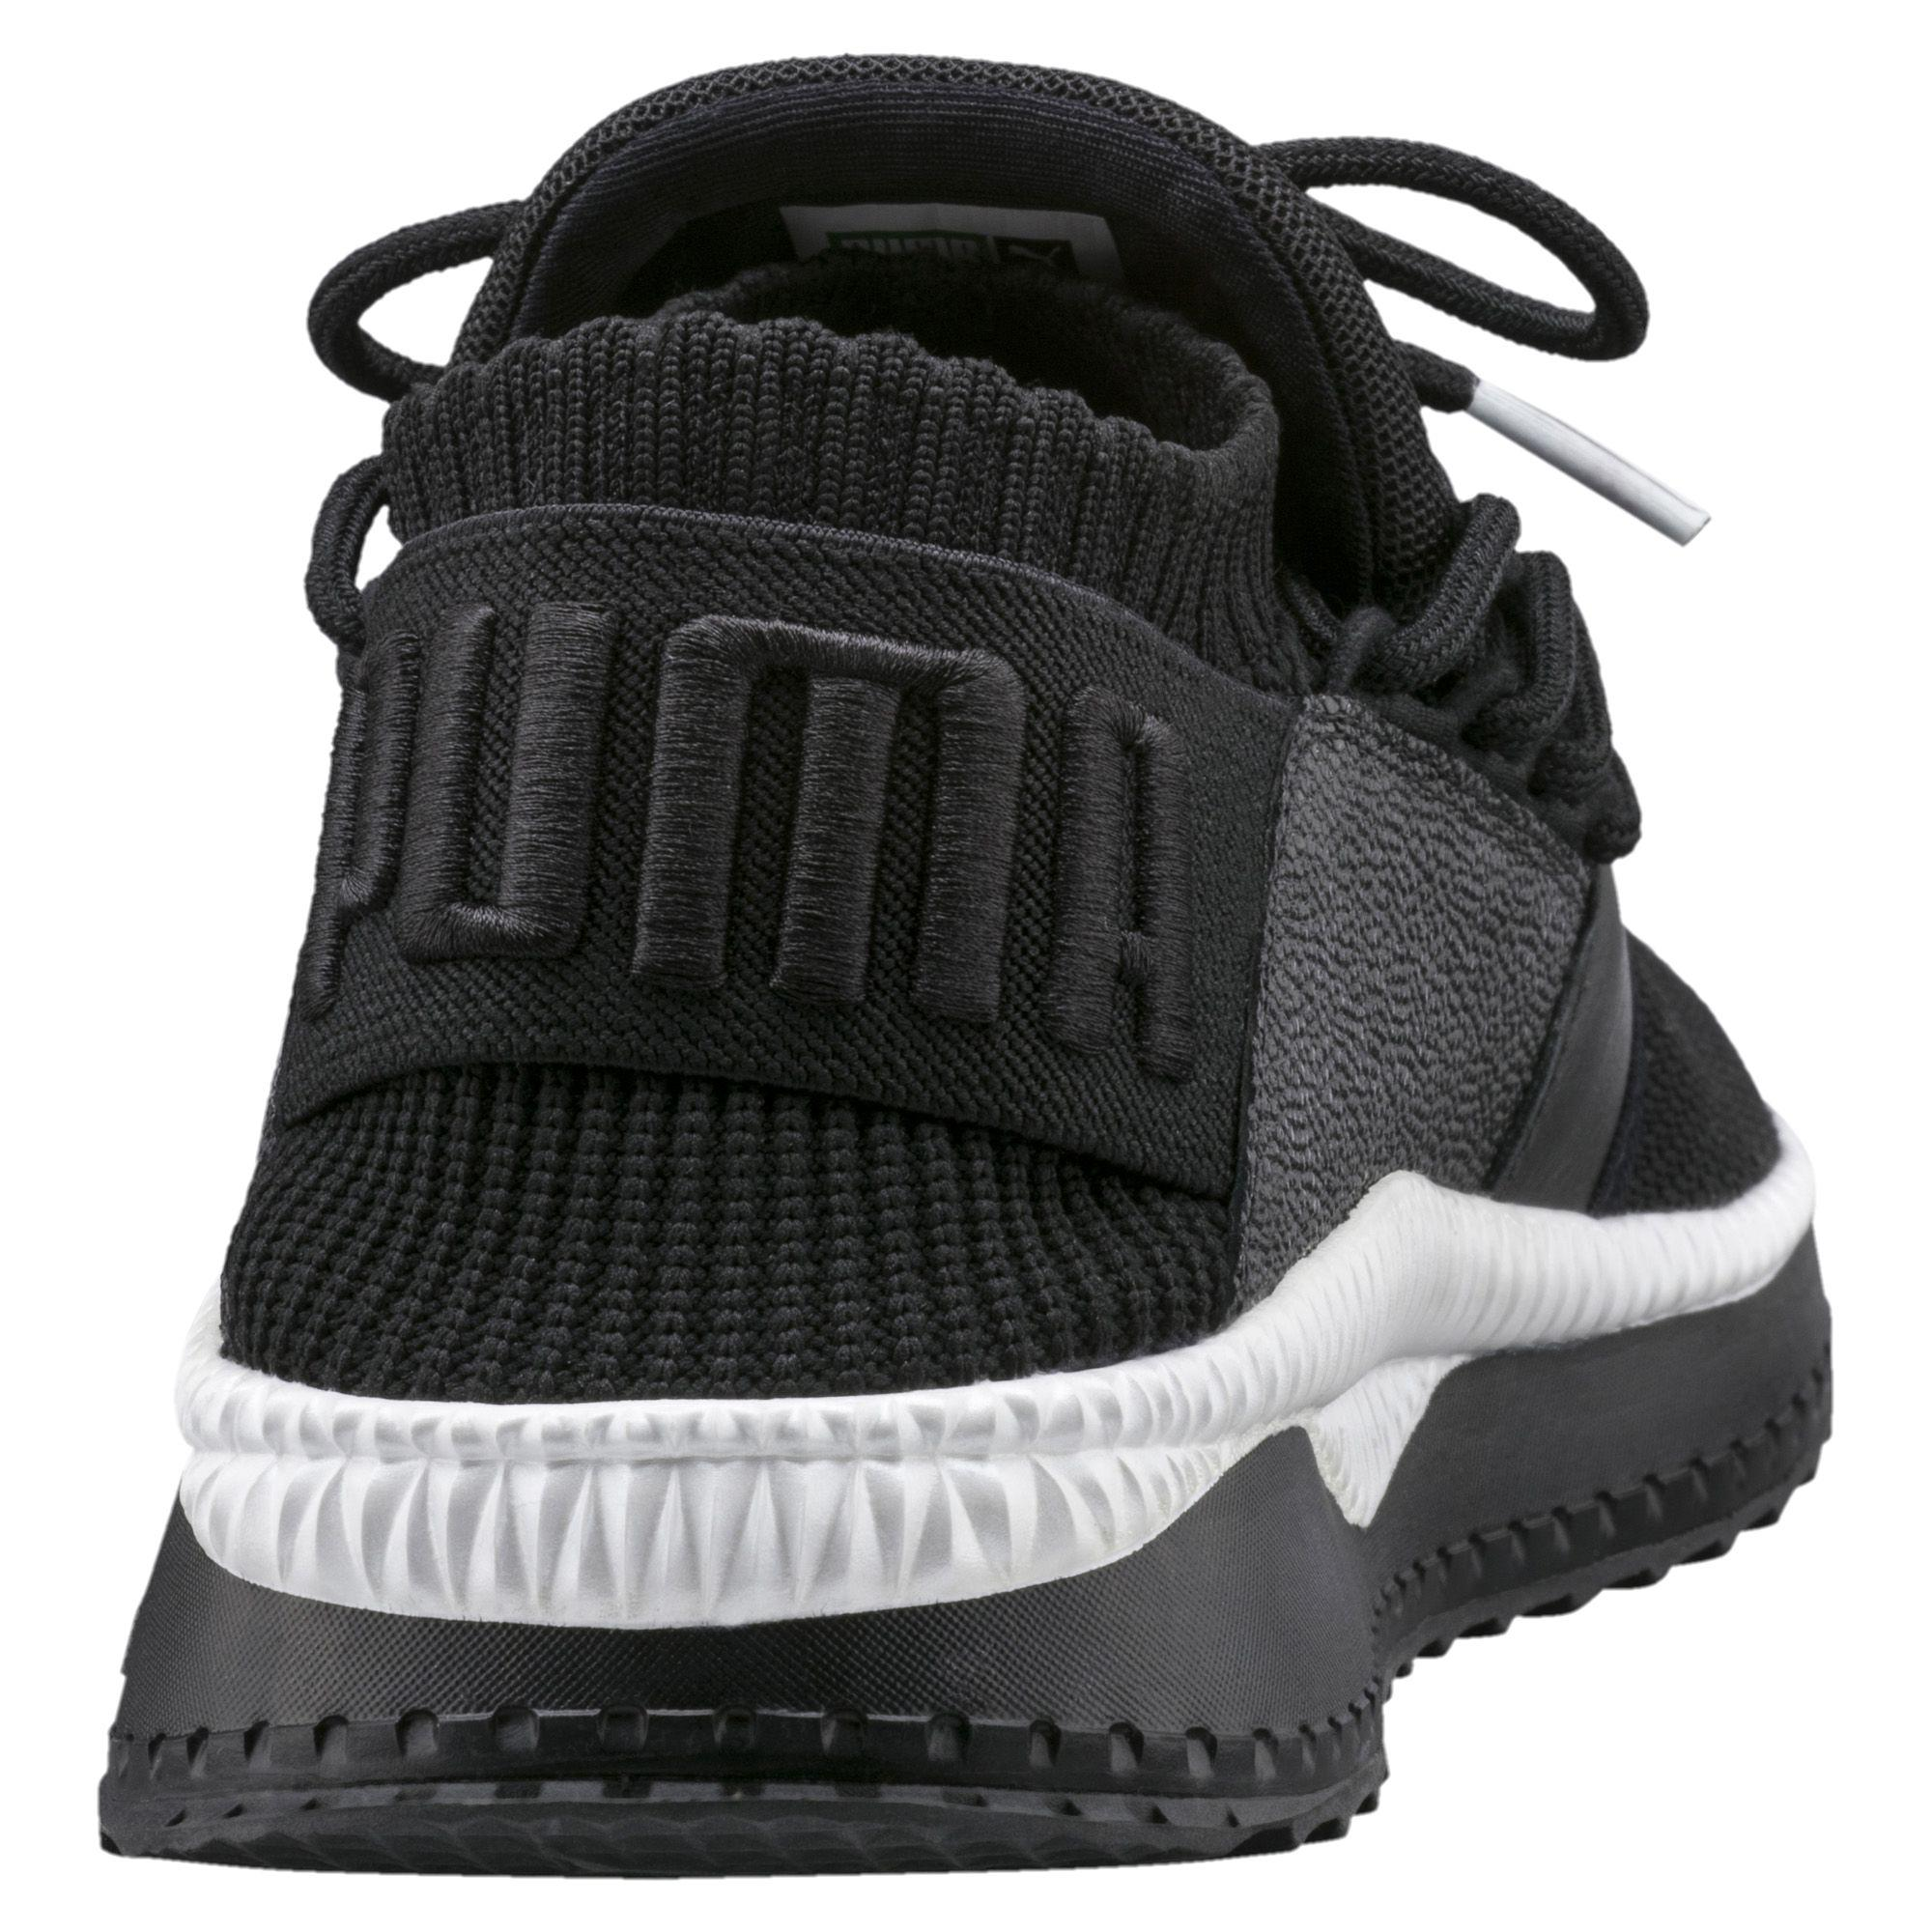 Lyst - PUMA Tsugi Shinsei Caviar Men s Training Shoes in Black for Men 272cb47ce